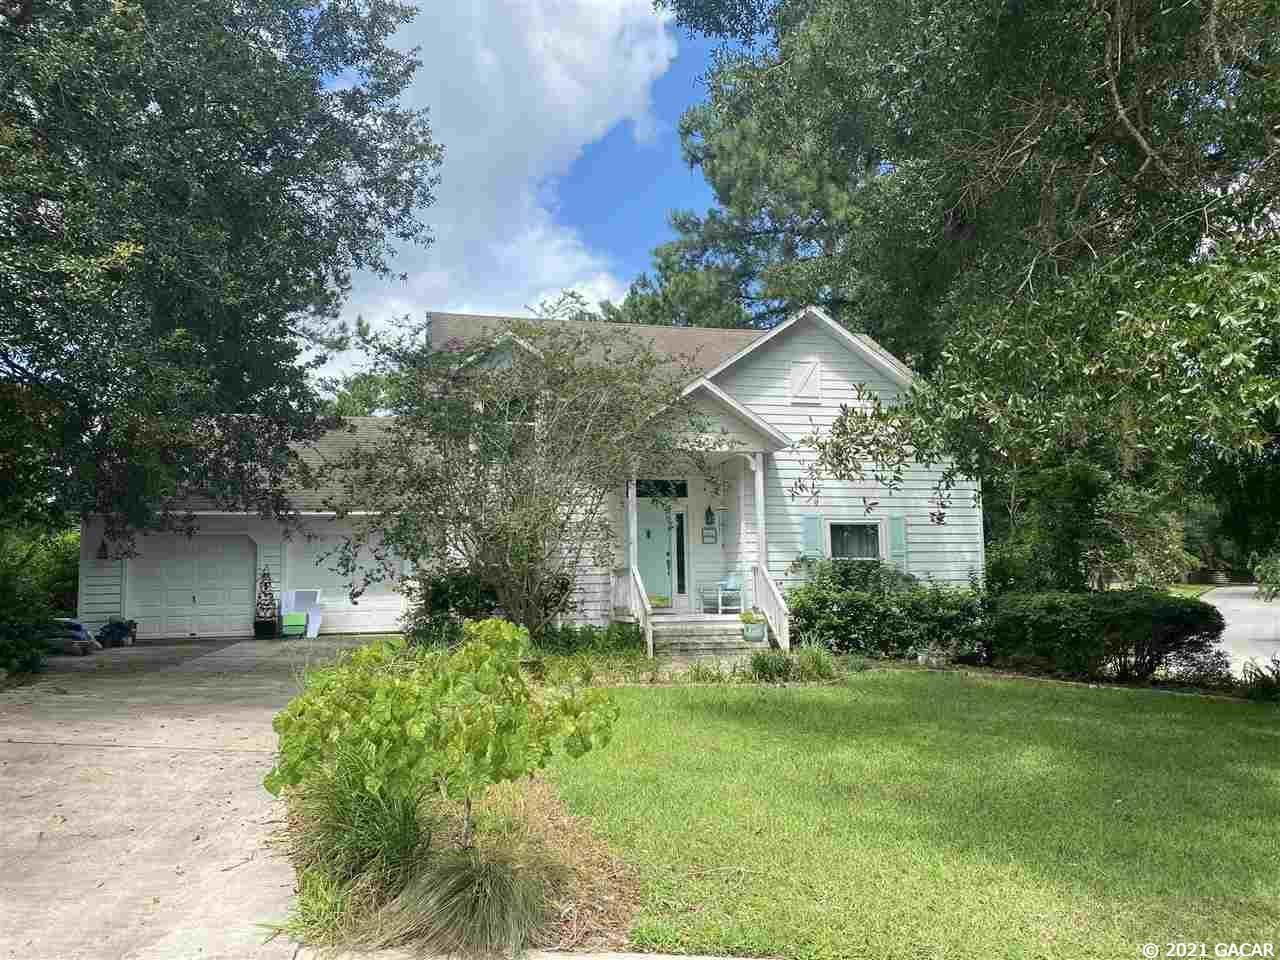 8353 NW 36 Avenue, Gainesville, FL 32606 - #: 446565